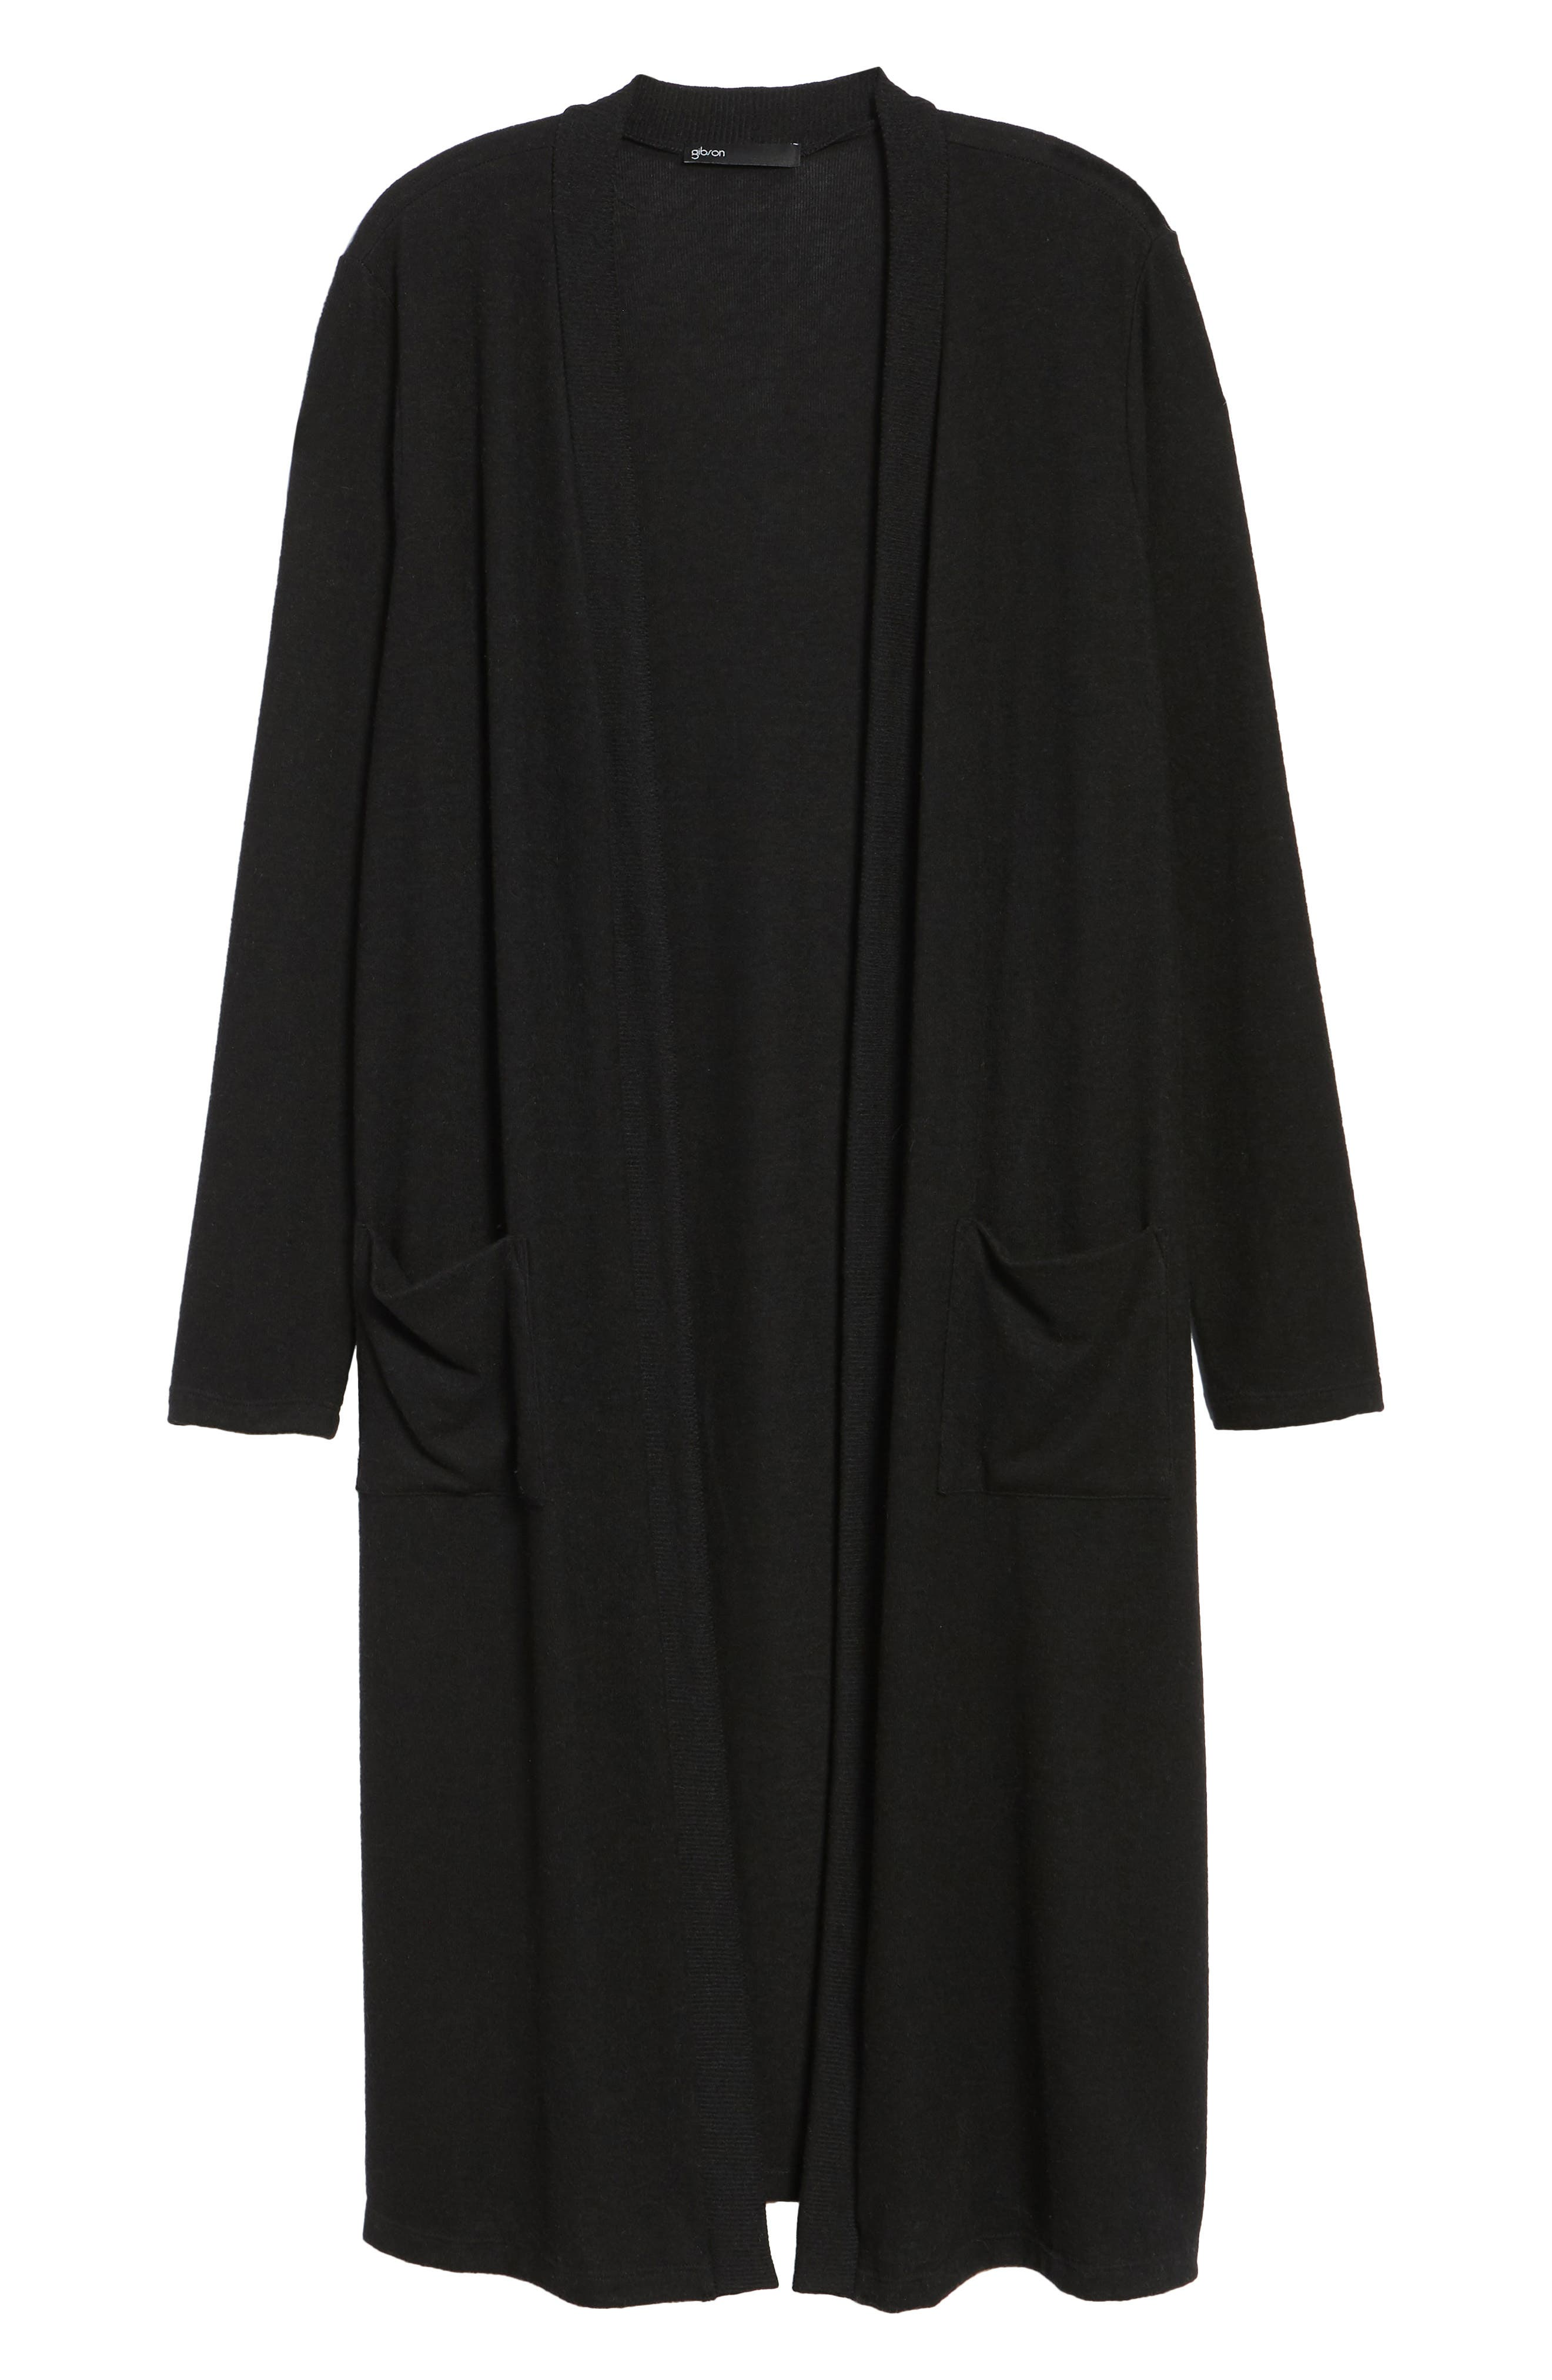 Long Fleece Open Cardigan,                             Alternate thumbnail 7, color,                             Black